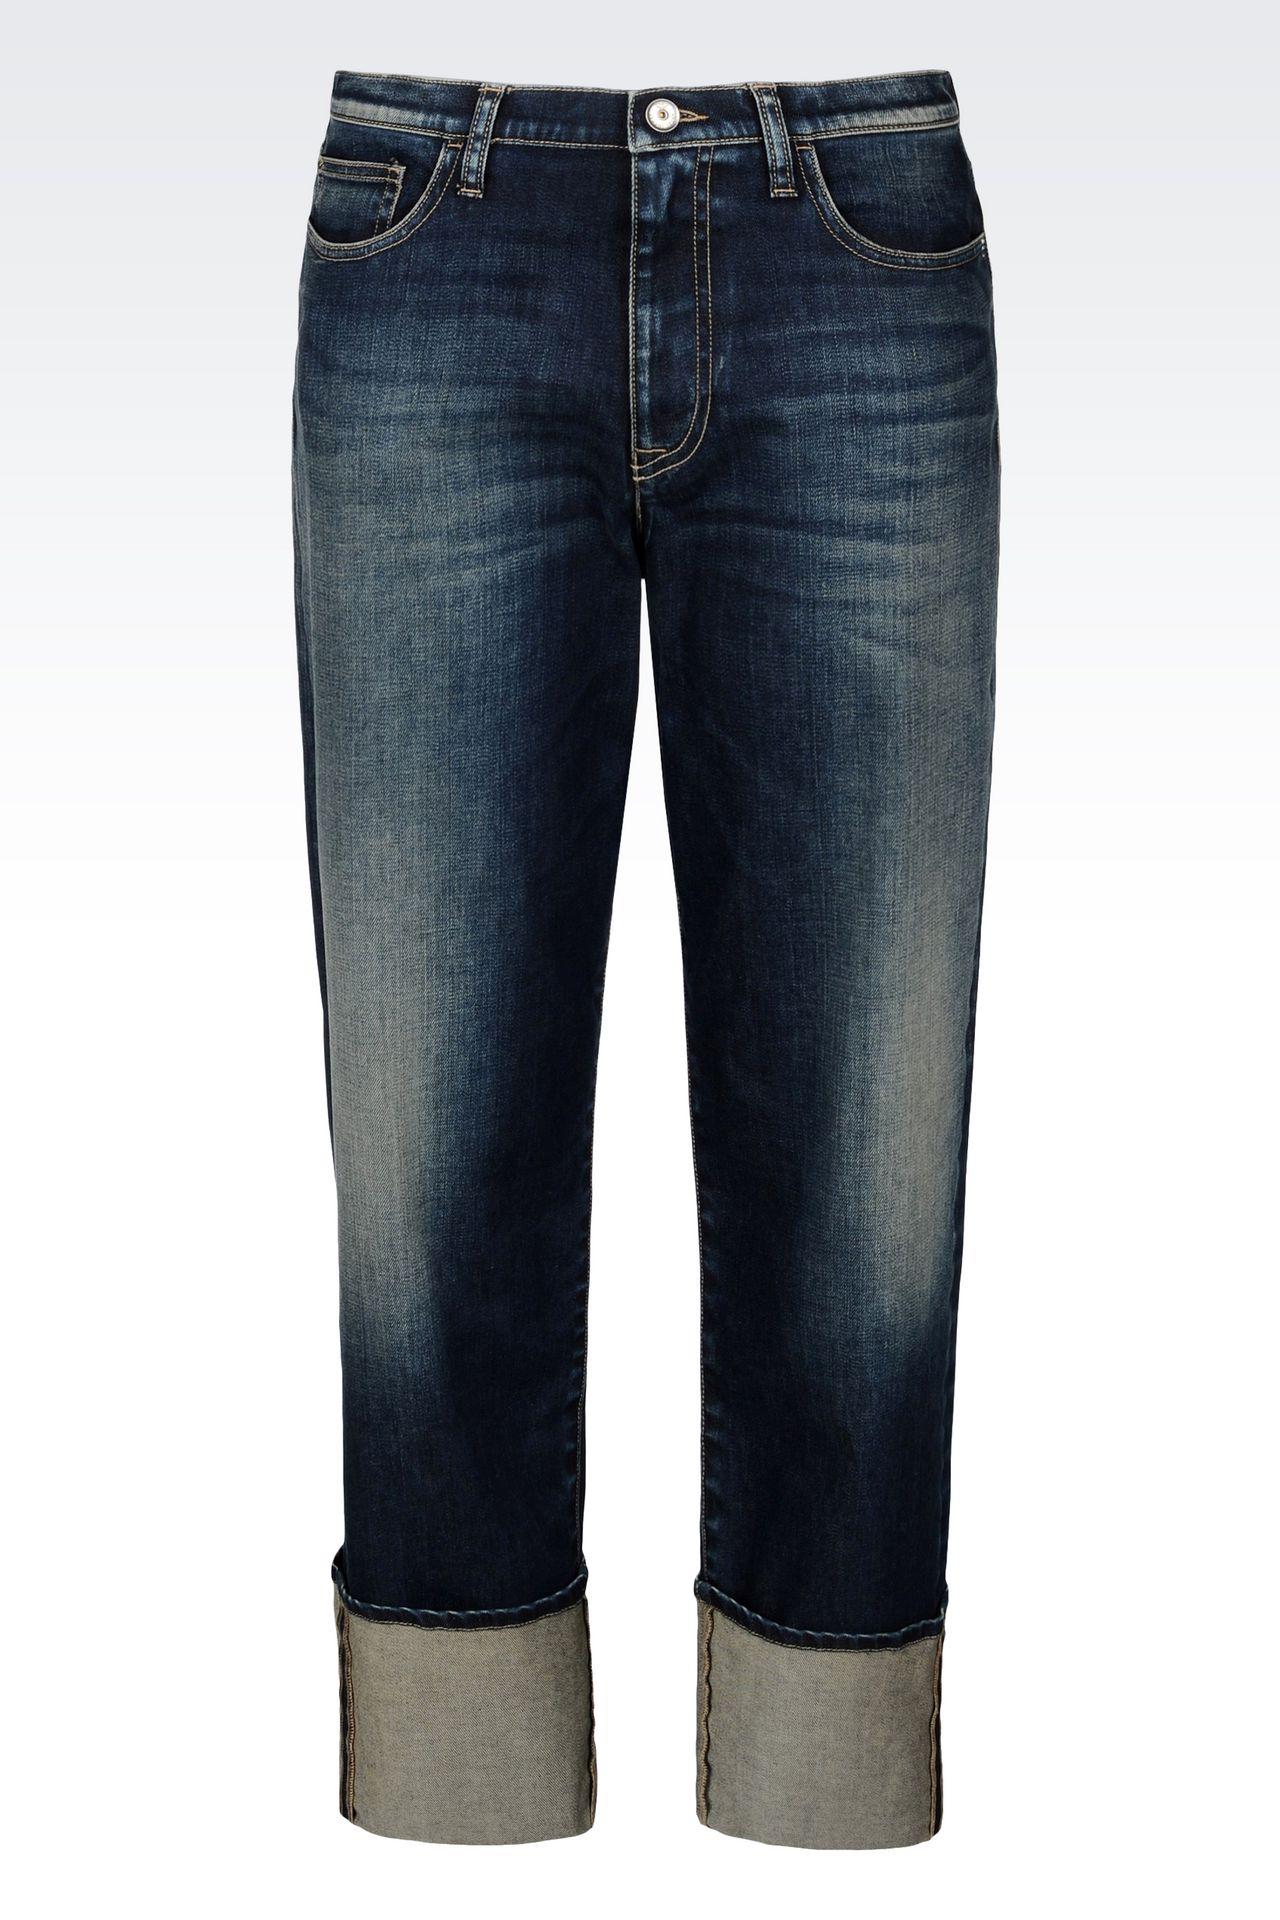 LOOSE FIT MEDIUM DARK WASH JEANS: Jeans Women by Armani - 0